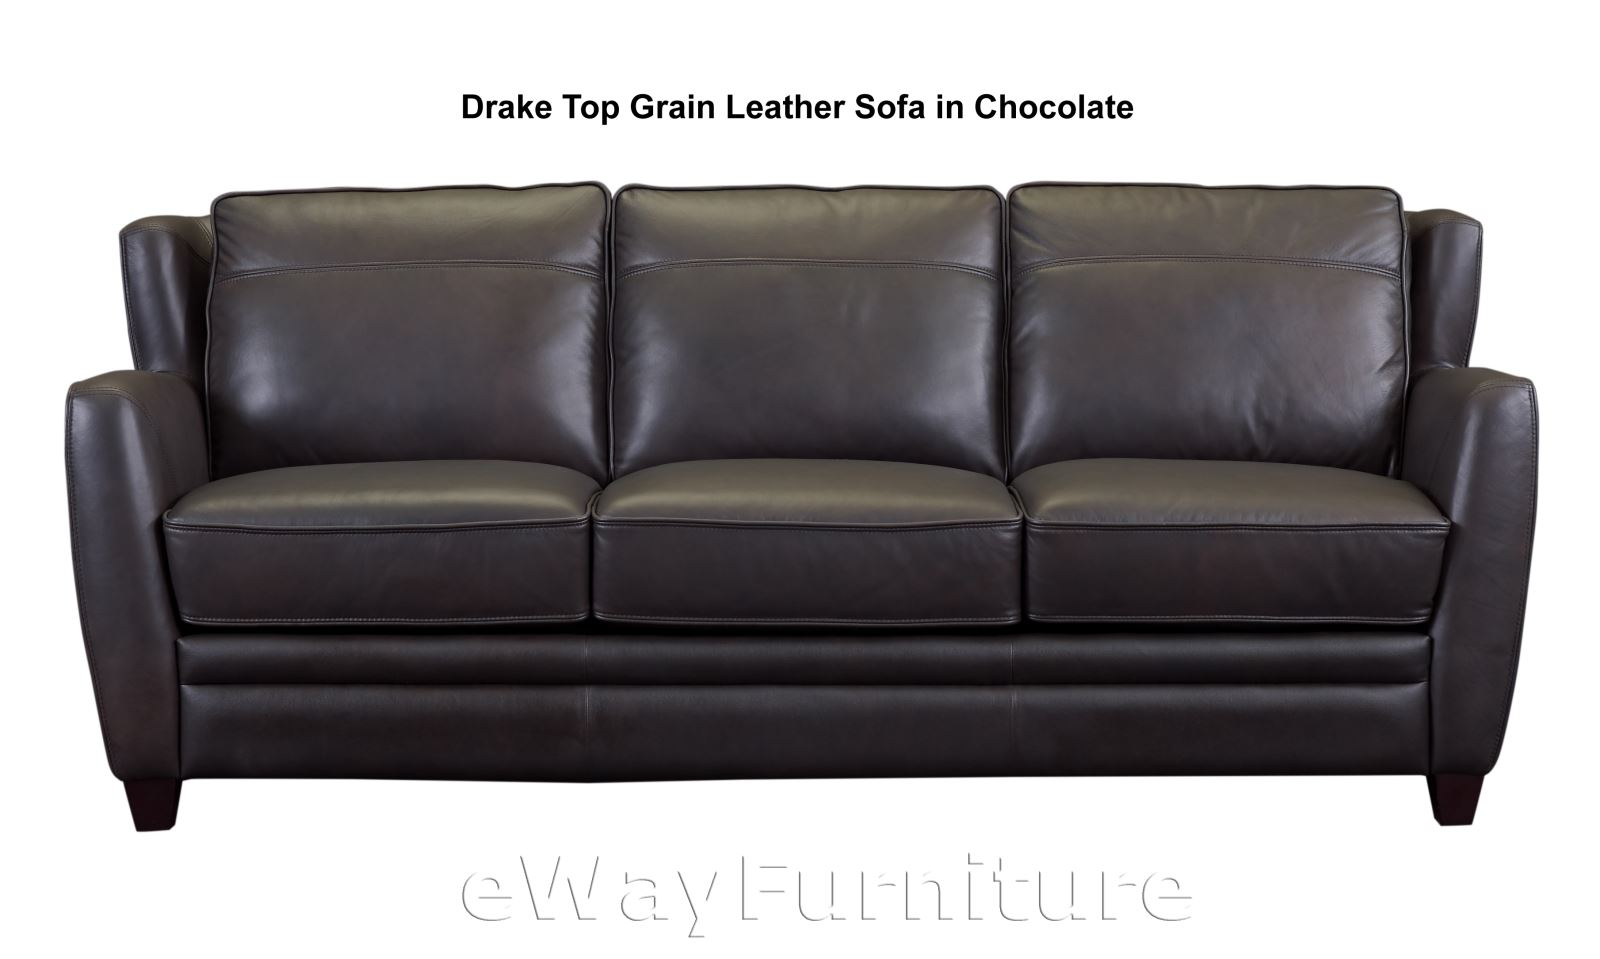 Drake Top Grain Leather Sofa In Chocolate